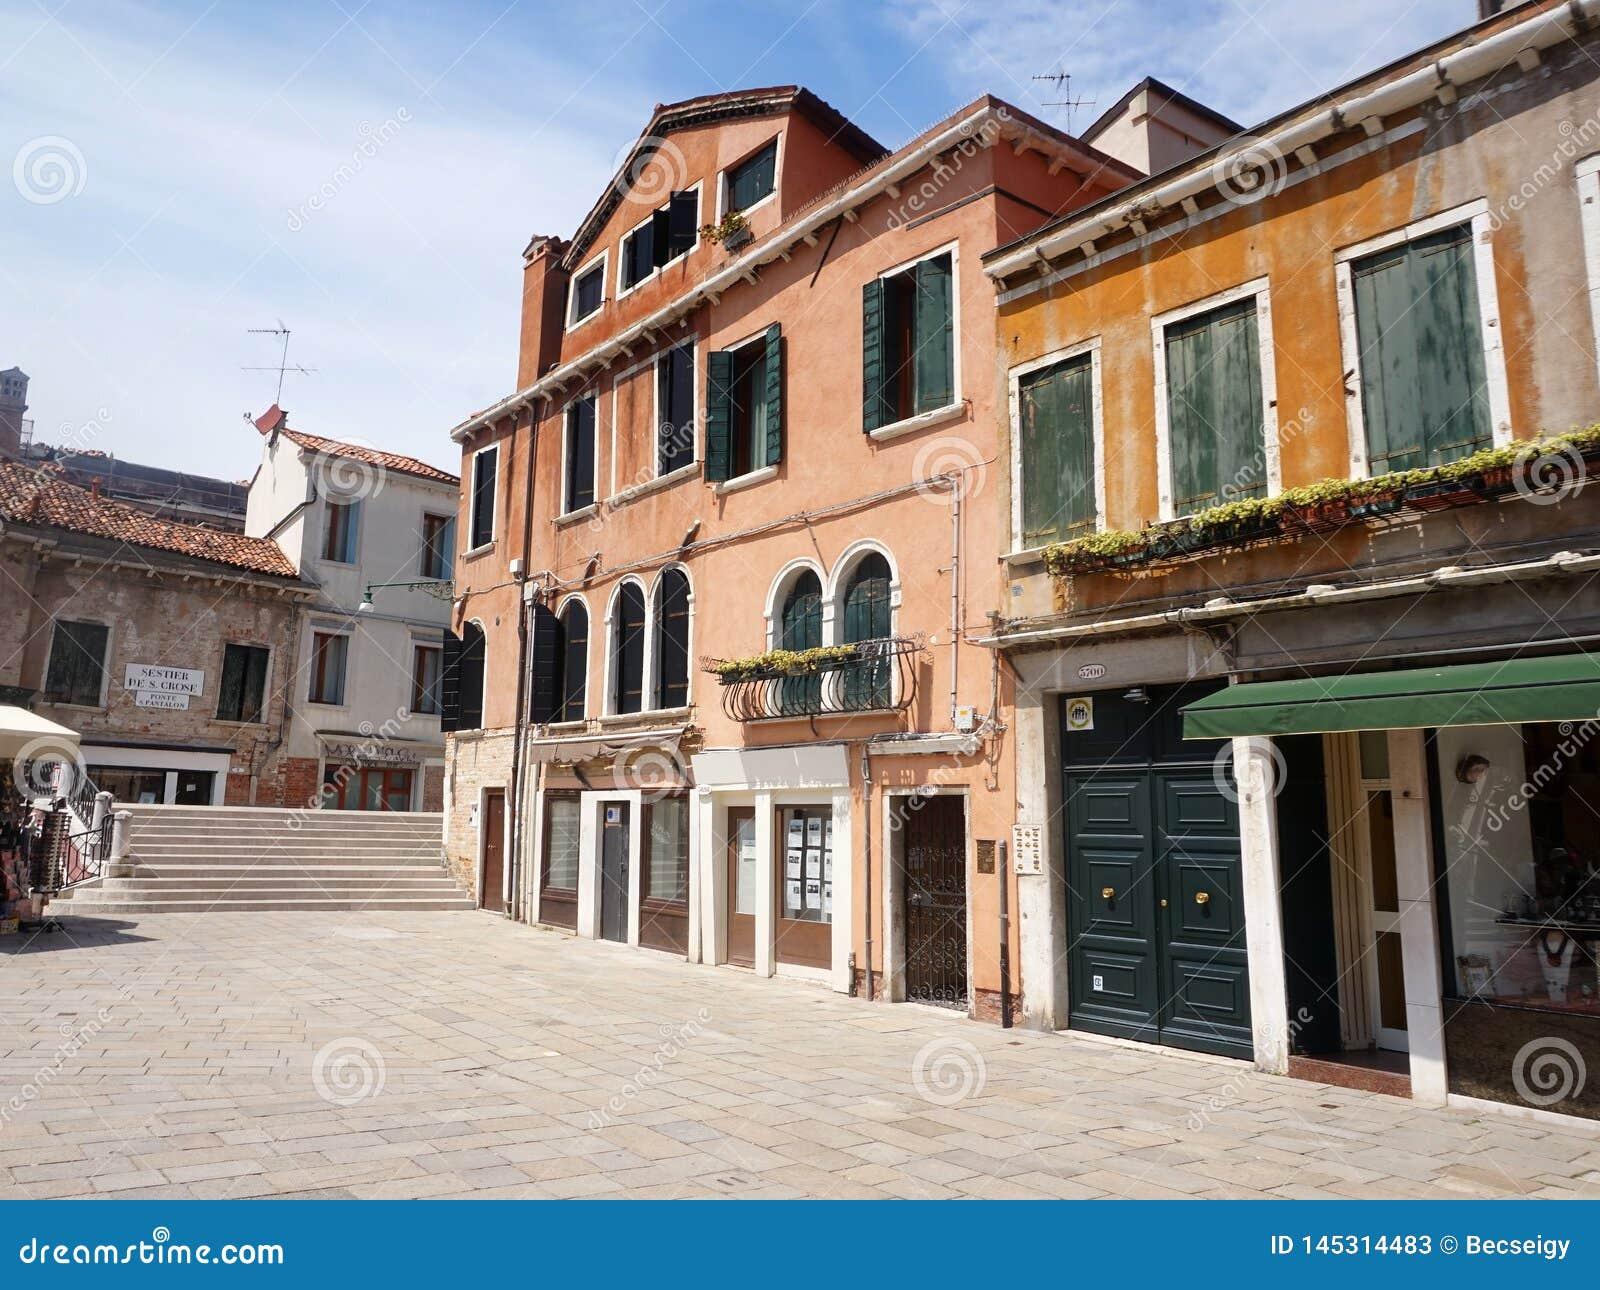 Oud Venetiaans huis in Campo San Pantalon - Venetië, Italië